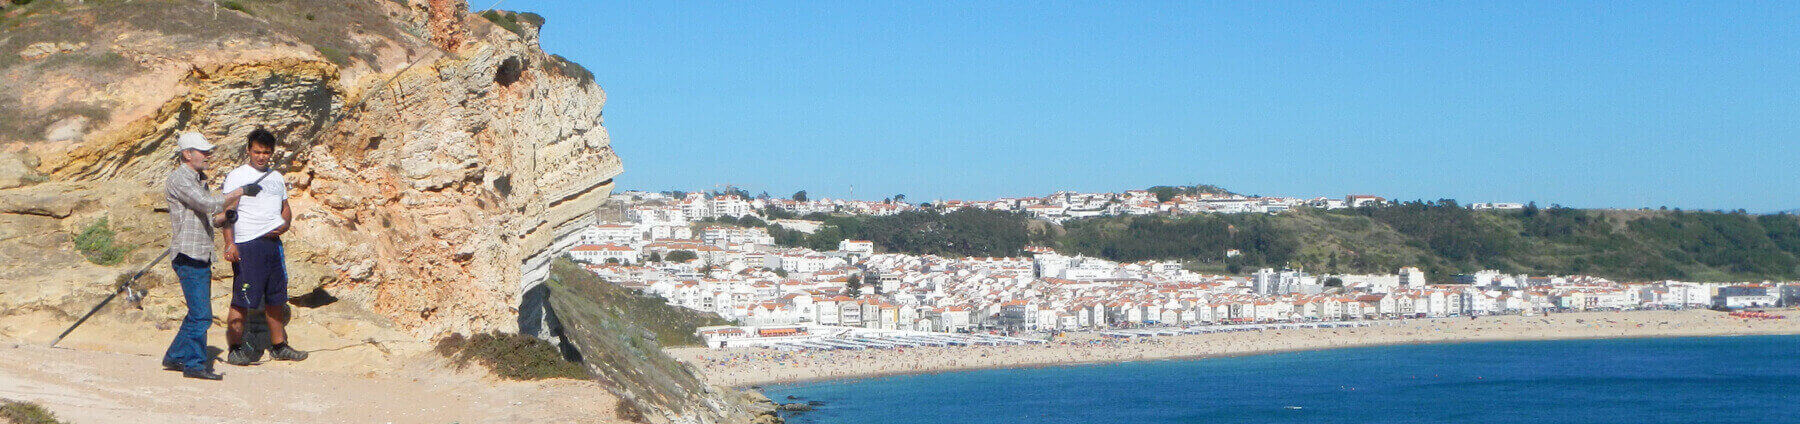 Fiske-Nazare-Silverkusten-Portugal